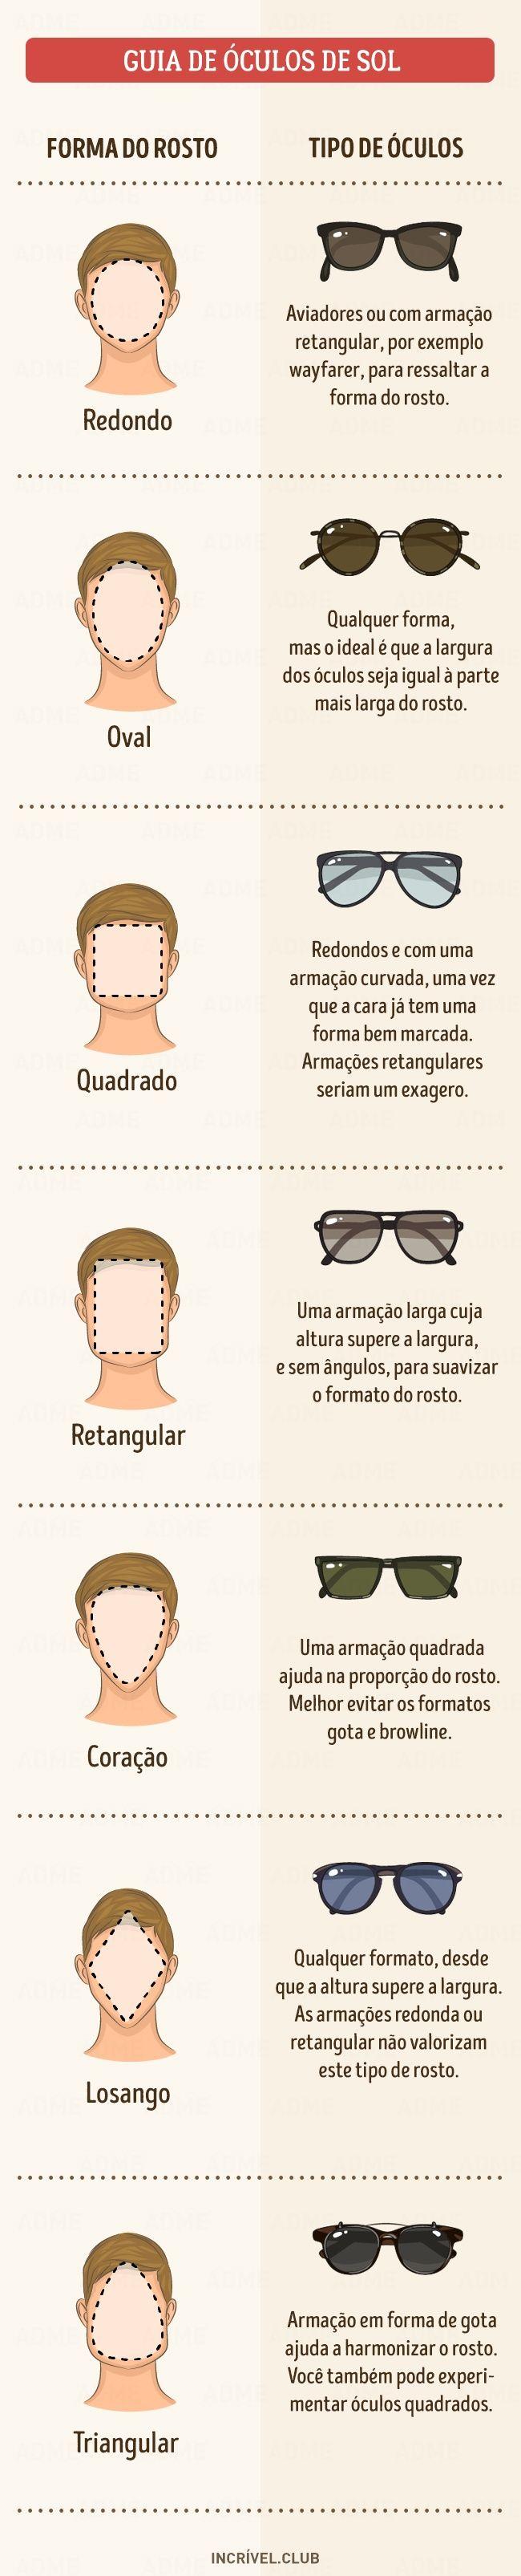 22d3496a0dae5 Guia de óculos de sol. Guia de óculos de sol Usando Óculos, Moda Masculina  ...